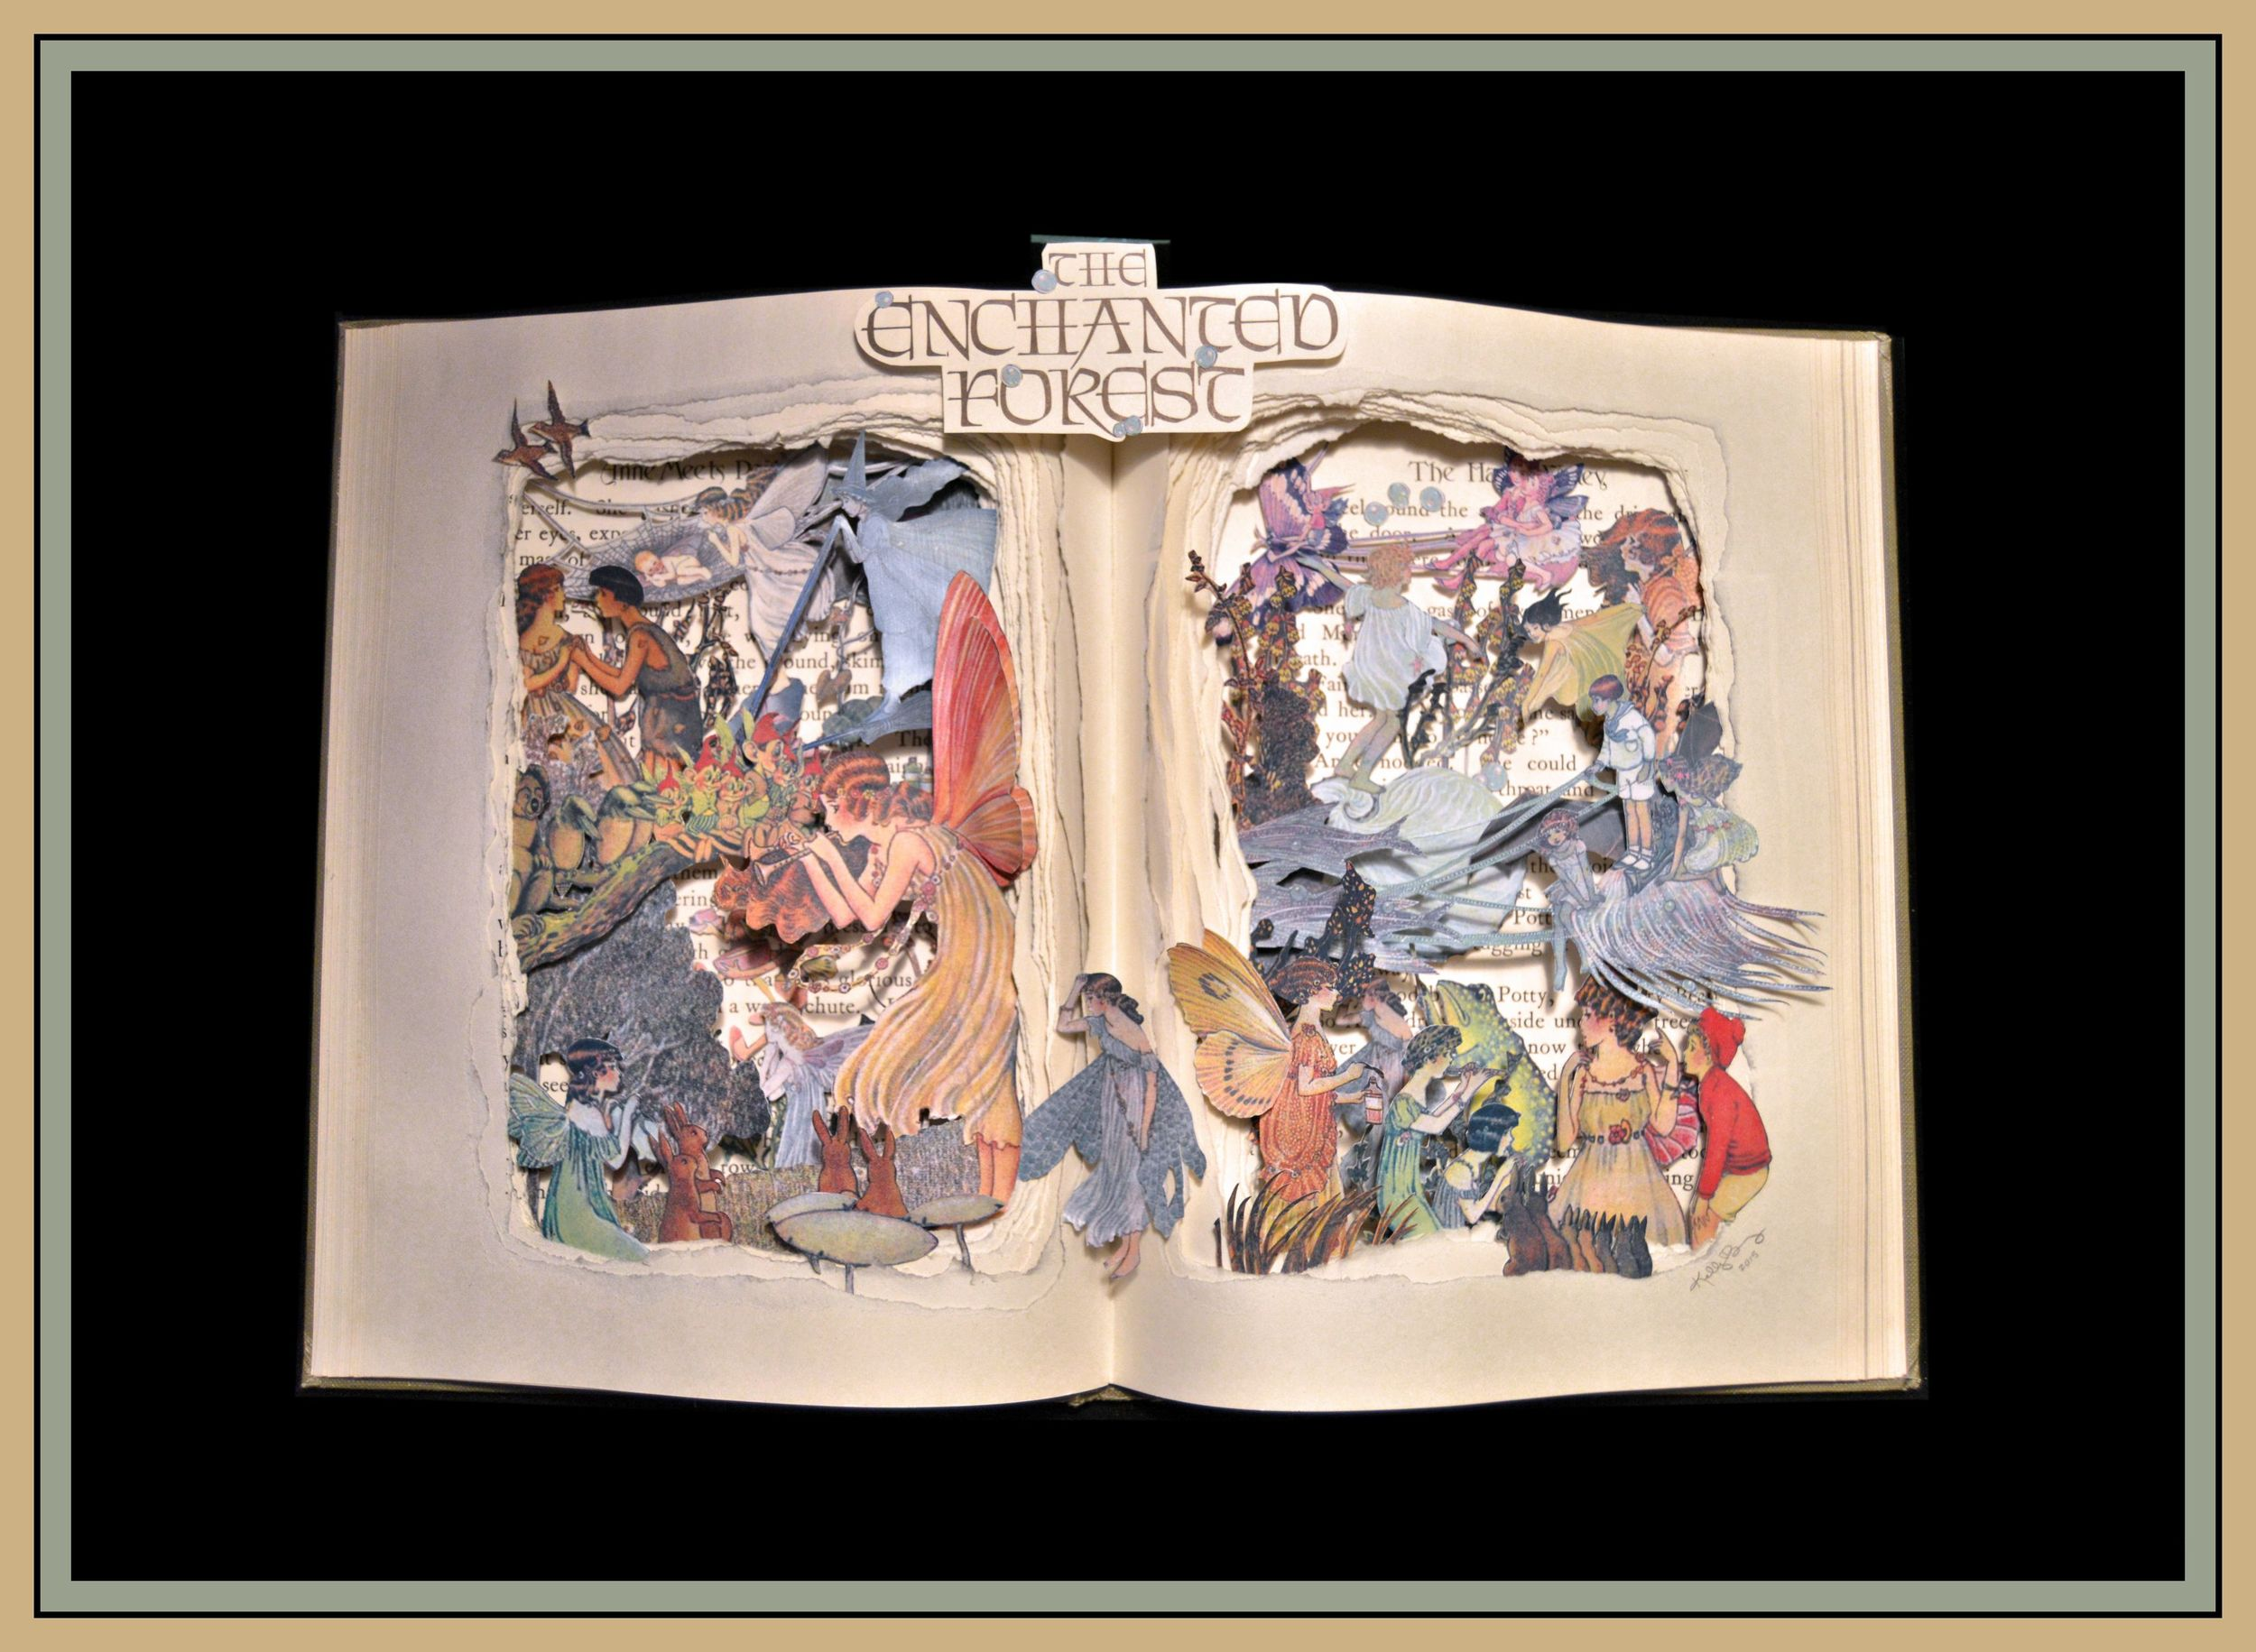 Enchanted Forest 12x16x3 Book Sculpture